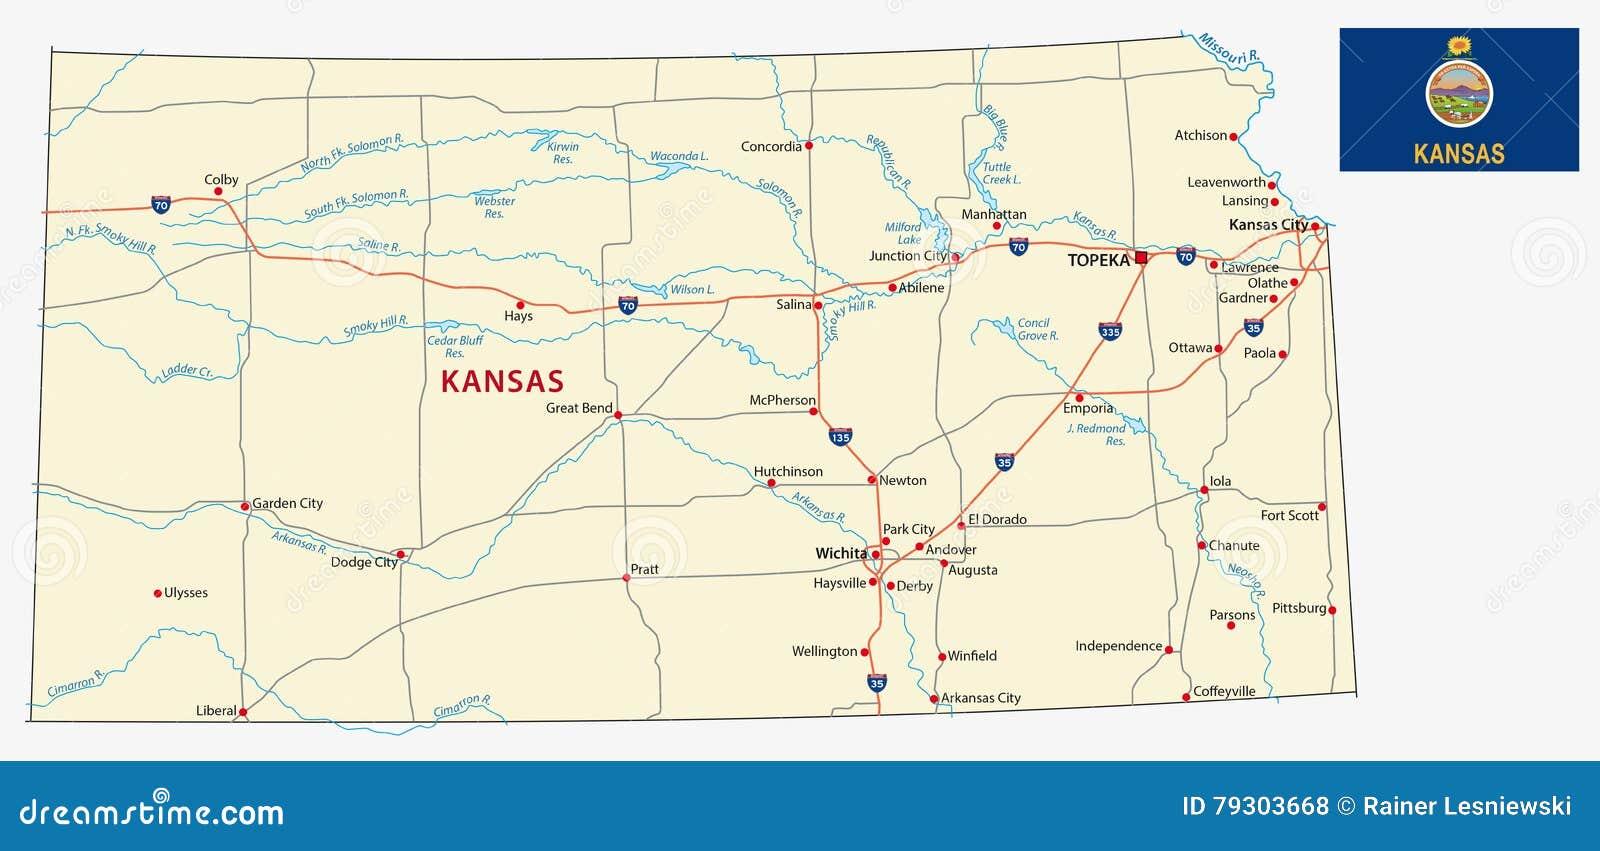 Kansas State Road Map on ks cities map, kansas highway road conditions, kansas on world map, kansas america map, tcu road map, kansas to colorado, topeka ks map, streets of lawrence map, eastern kansas county map, kansas county abbreviations, oklahoma road map, kansas road map online, kansas road atlas, kansas road map with cities, n. carolina road map, kansas toll roads, kansas map with highways, ucf road map, kansas road map colorado, wichita map,